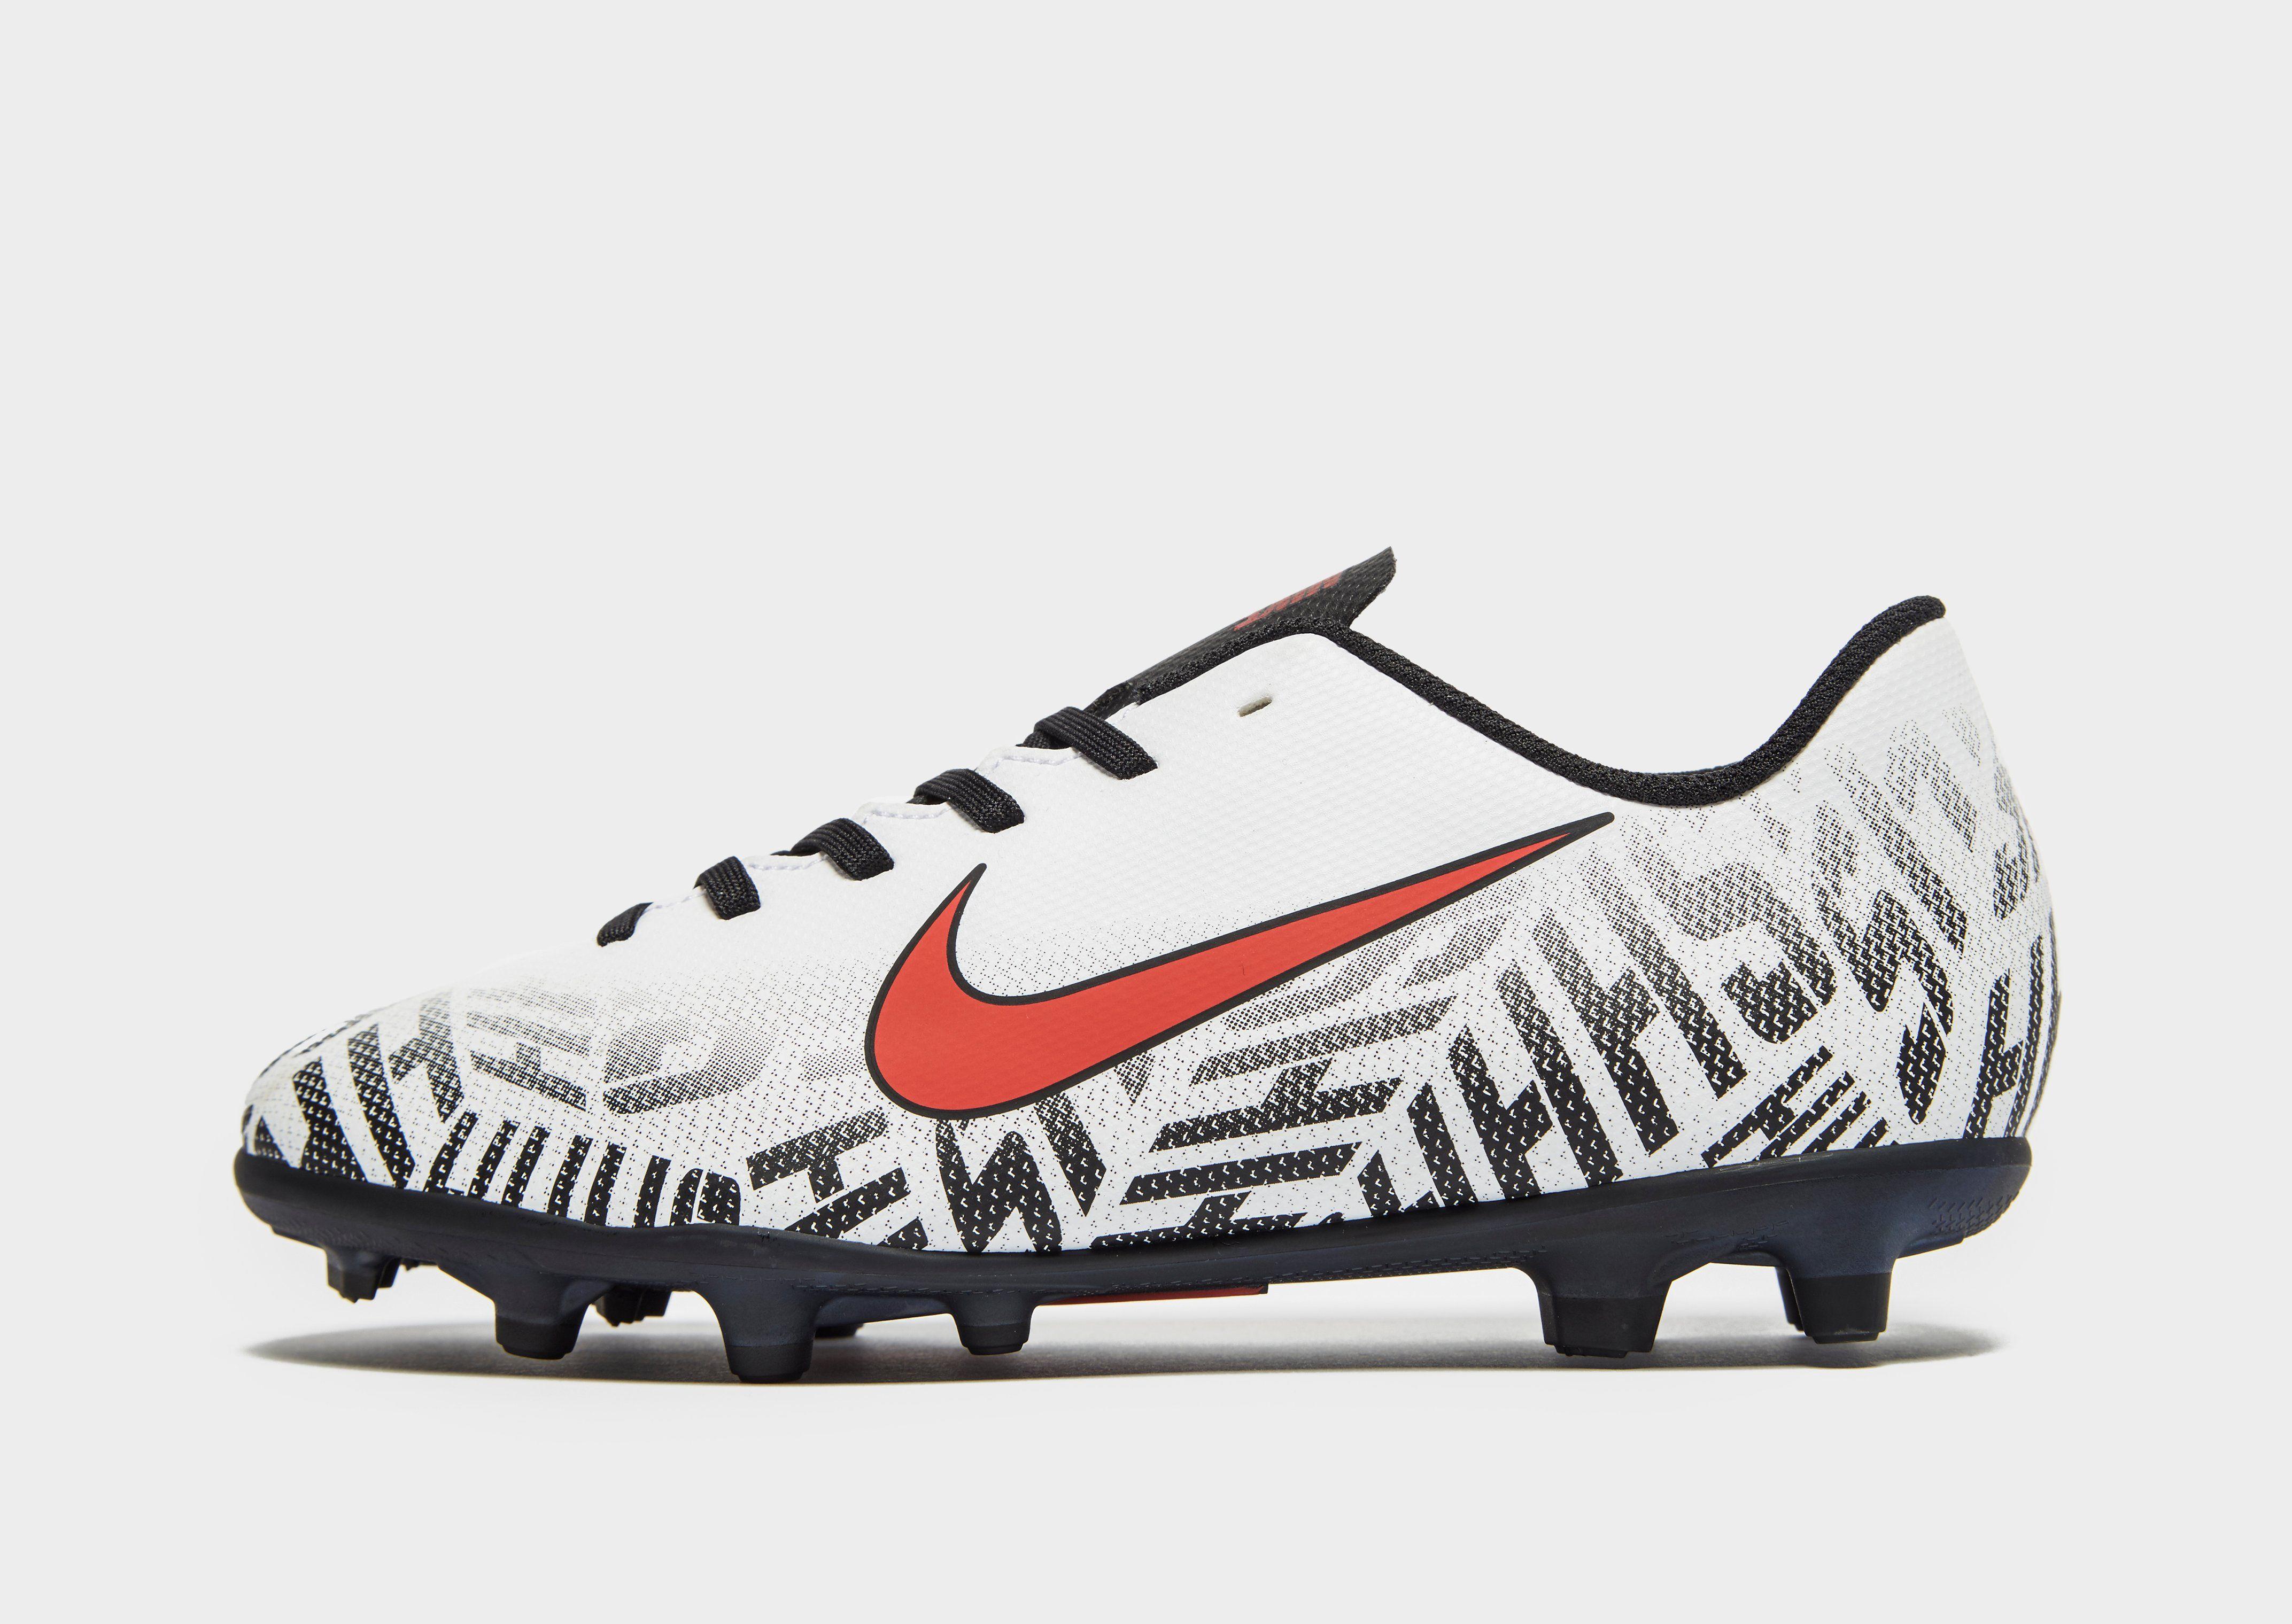 223c0181f Nike Silencio Mercurial Vapor Club Neymar Jr FG Junior